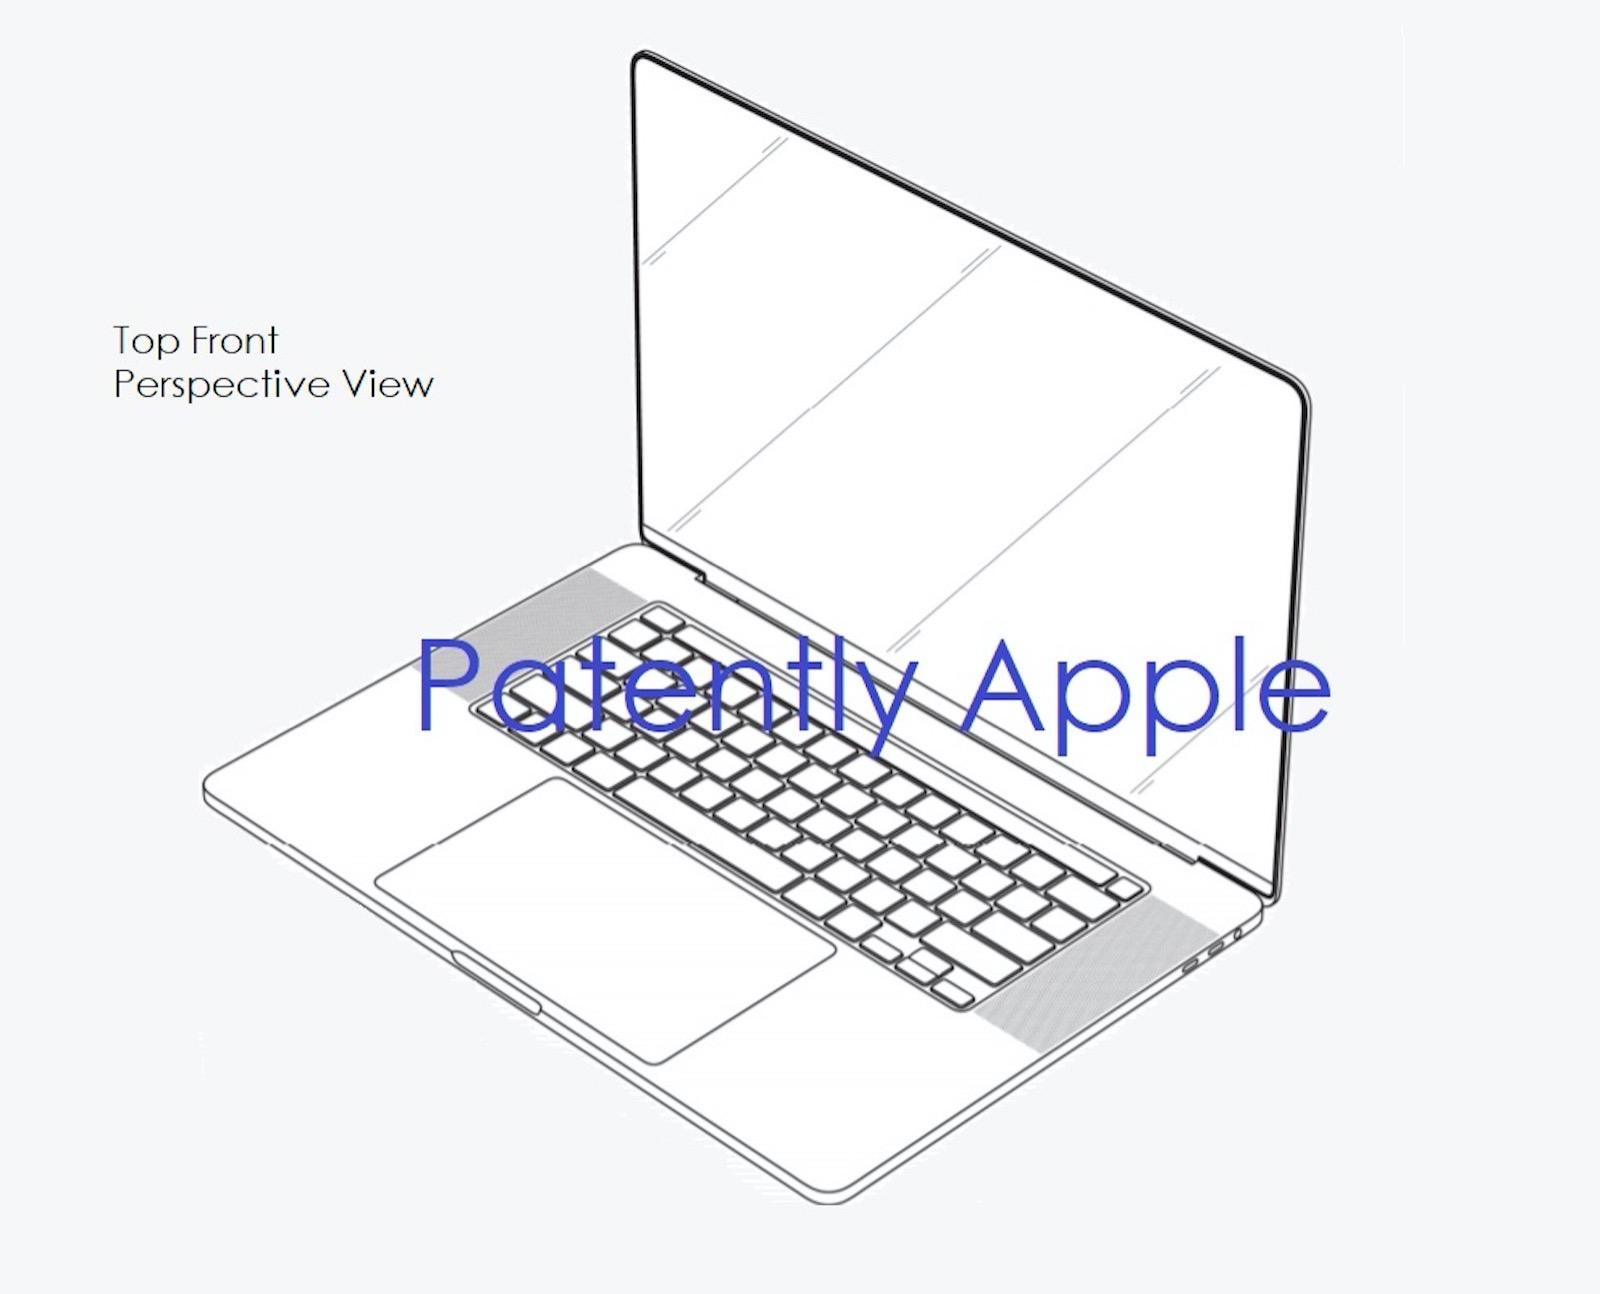 Apple macbookpro patetent 1